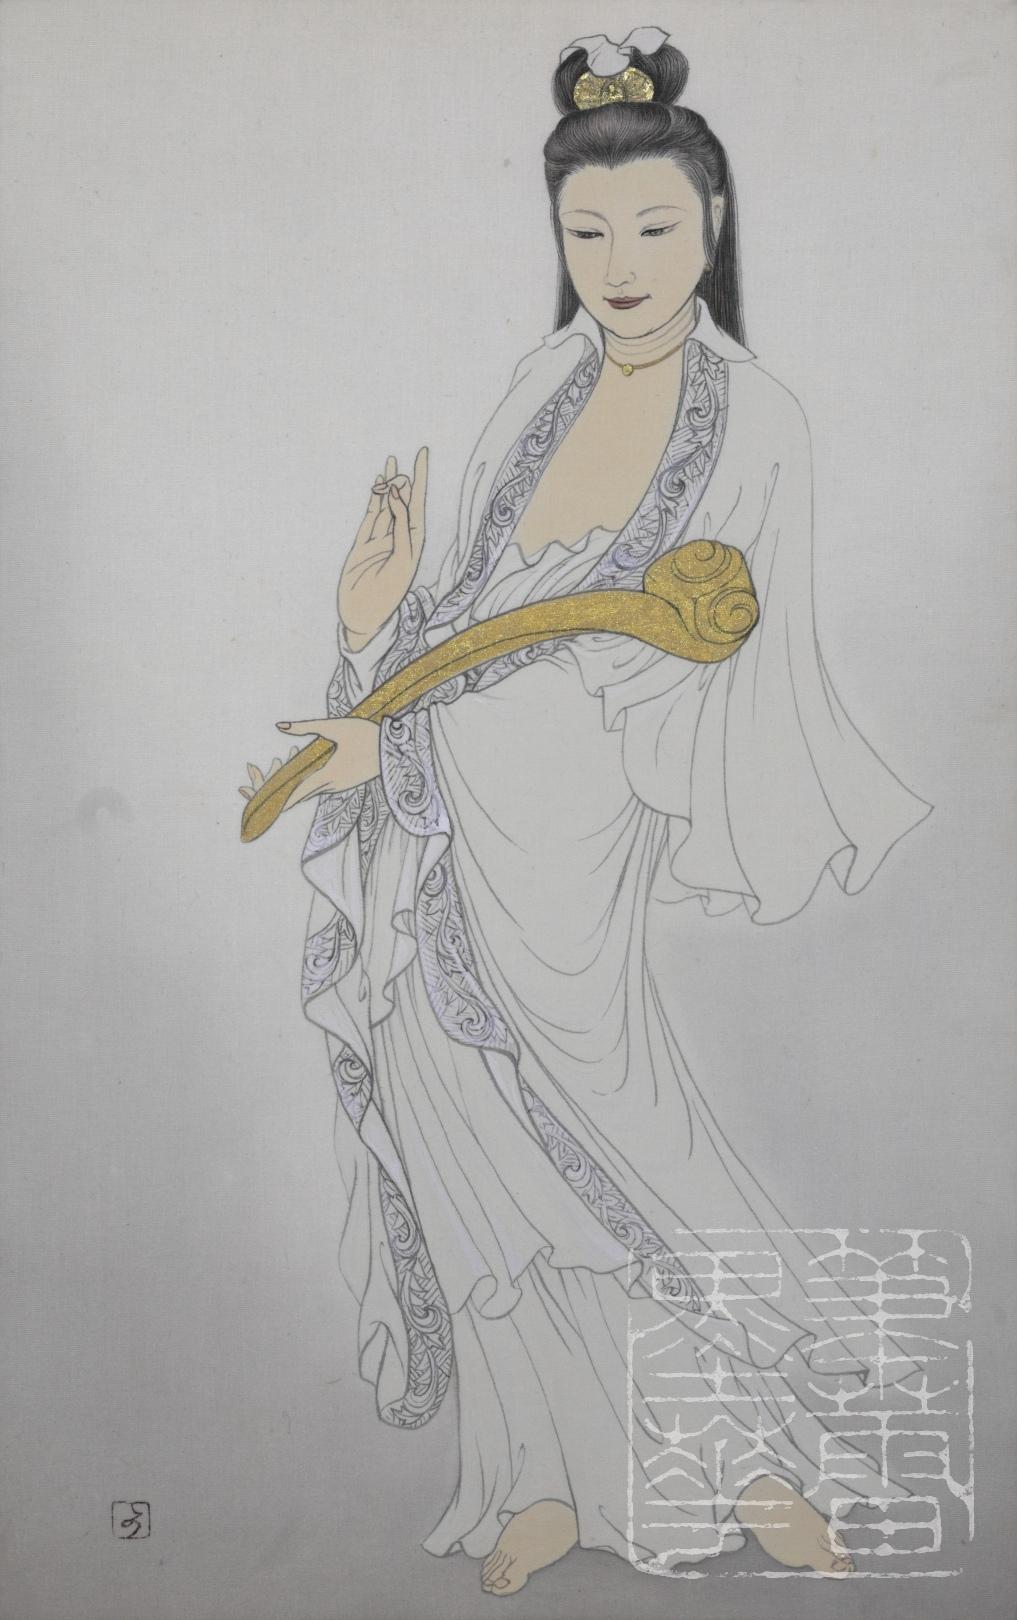 Golden ruyi (sceptor)